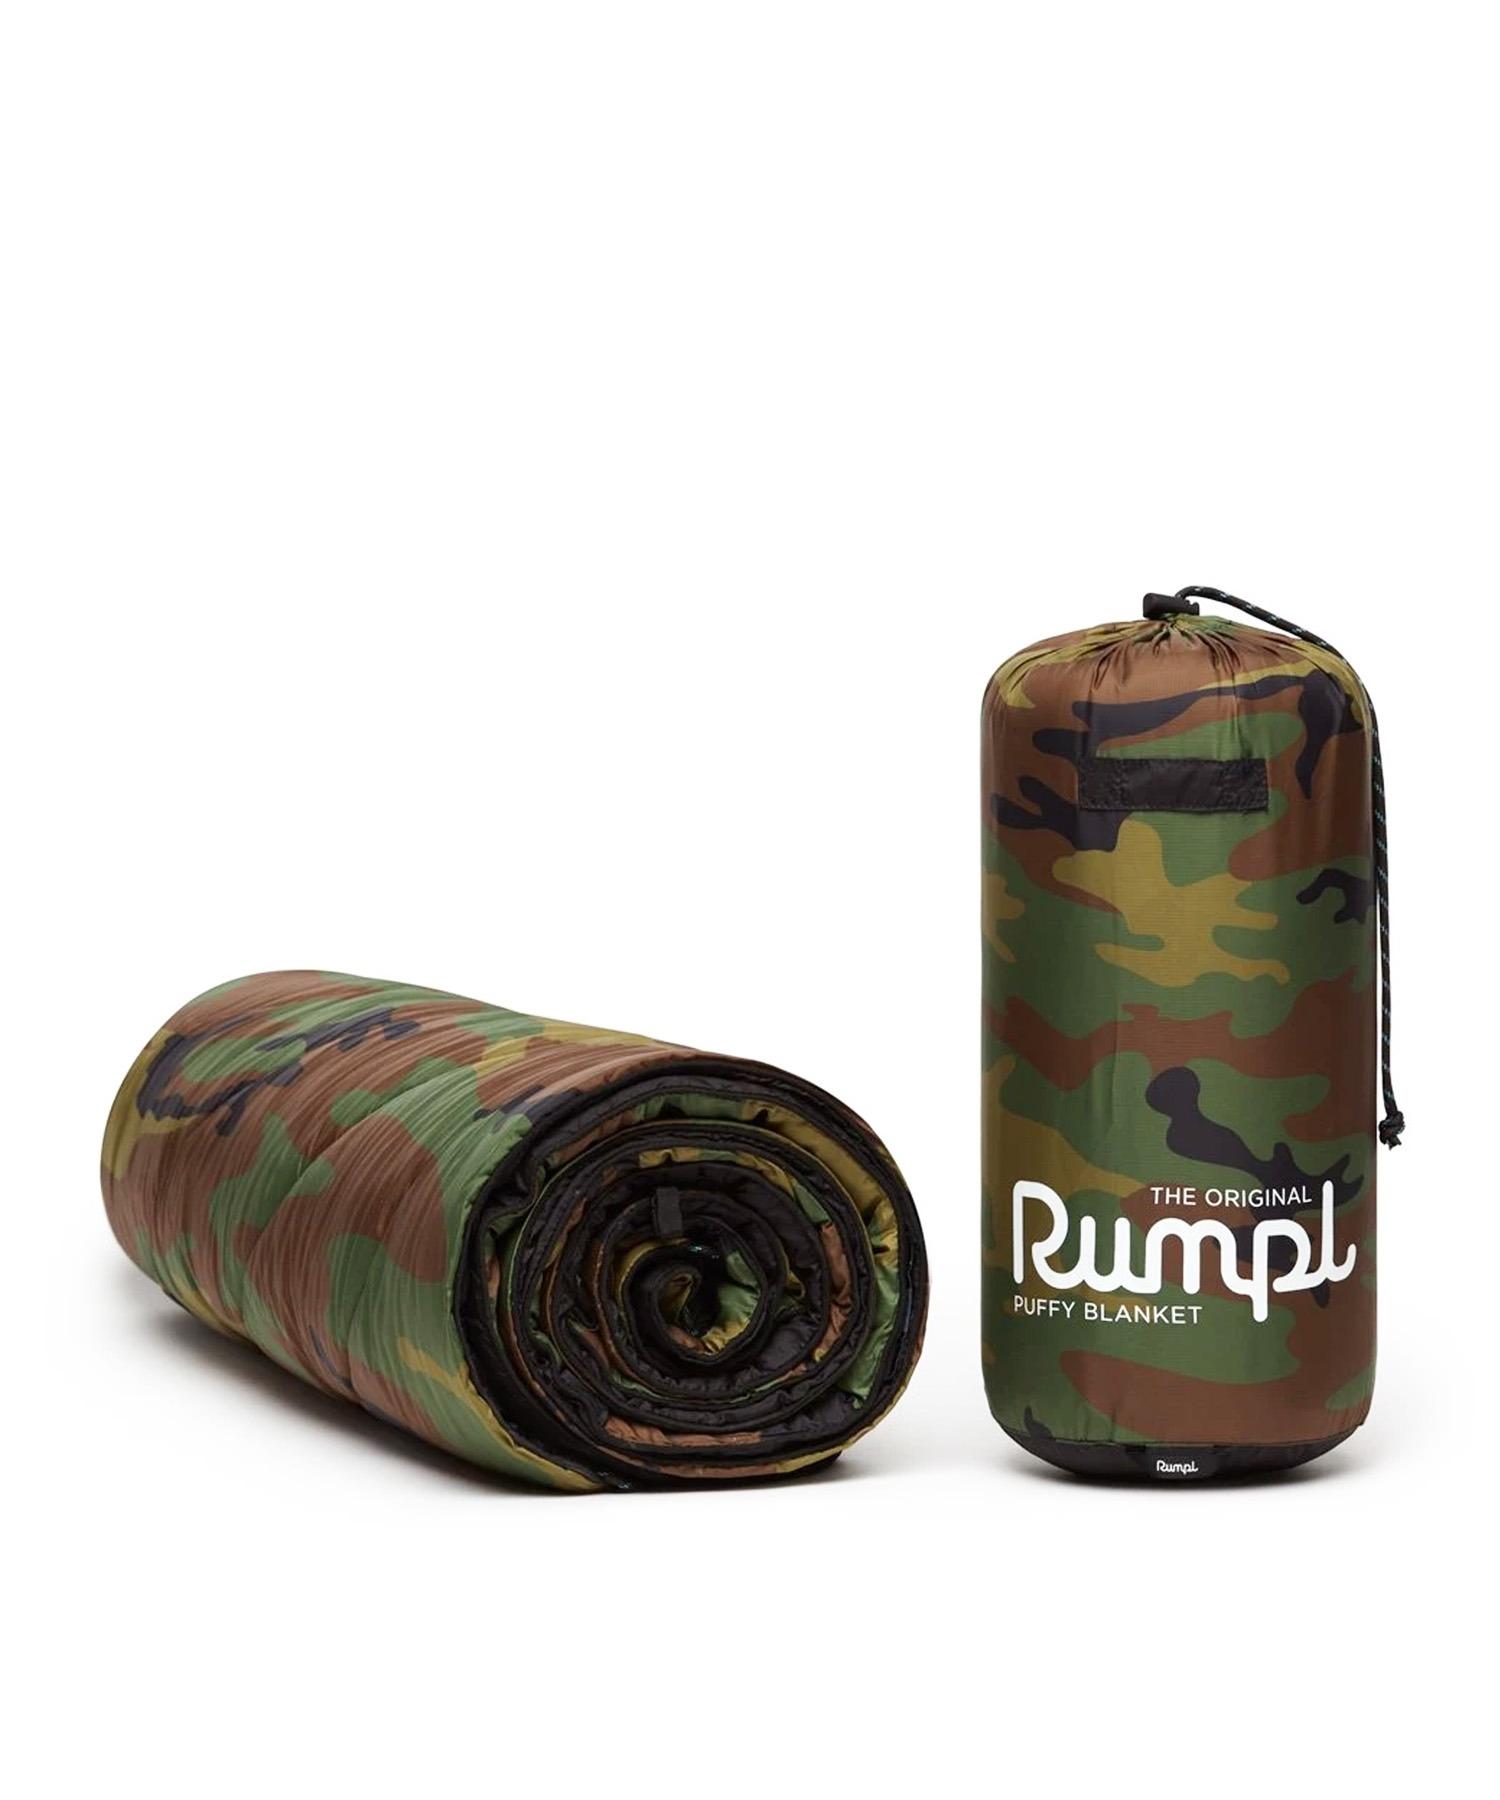 【 Rumpl / ランプル 】ORIGINAL PUFFY BLANKET PRINT オリジナル パフィー ブランケット